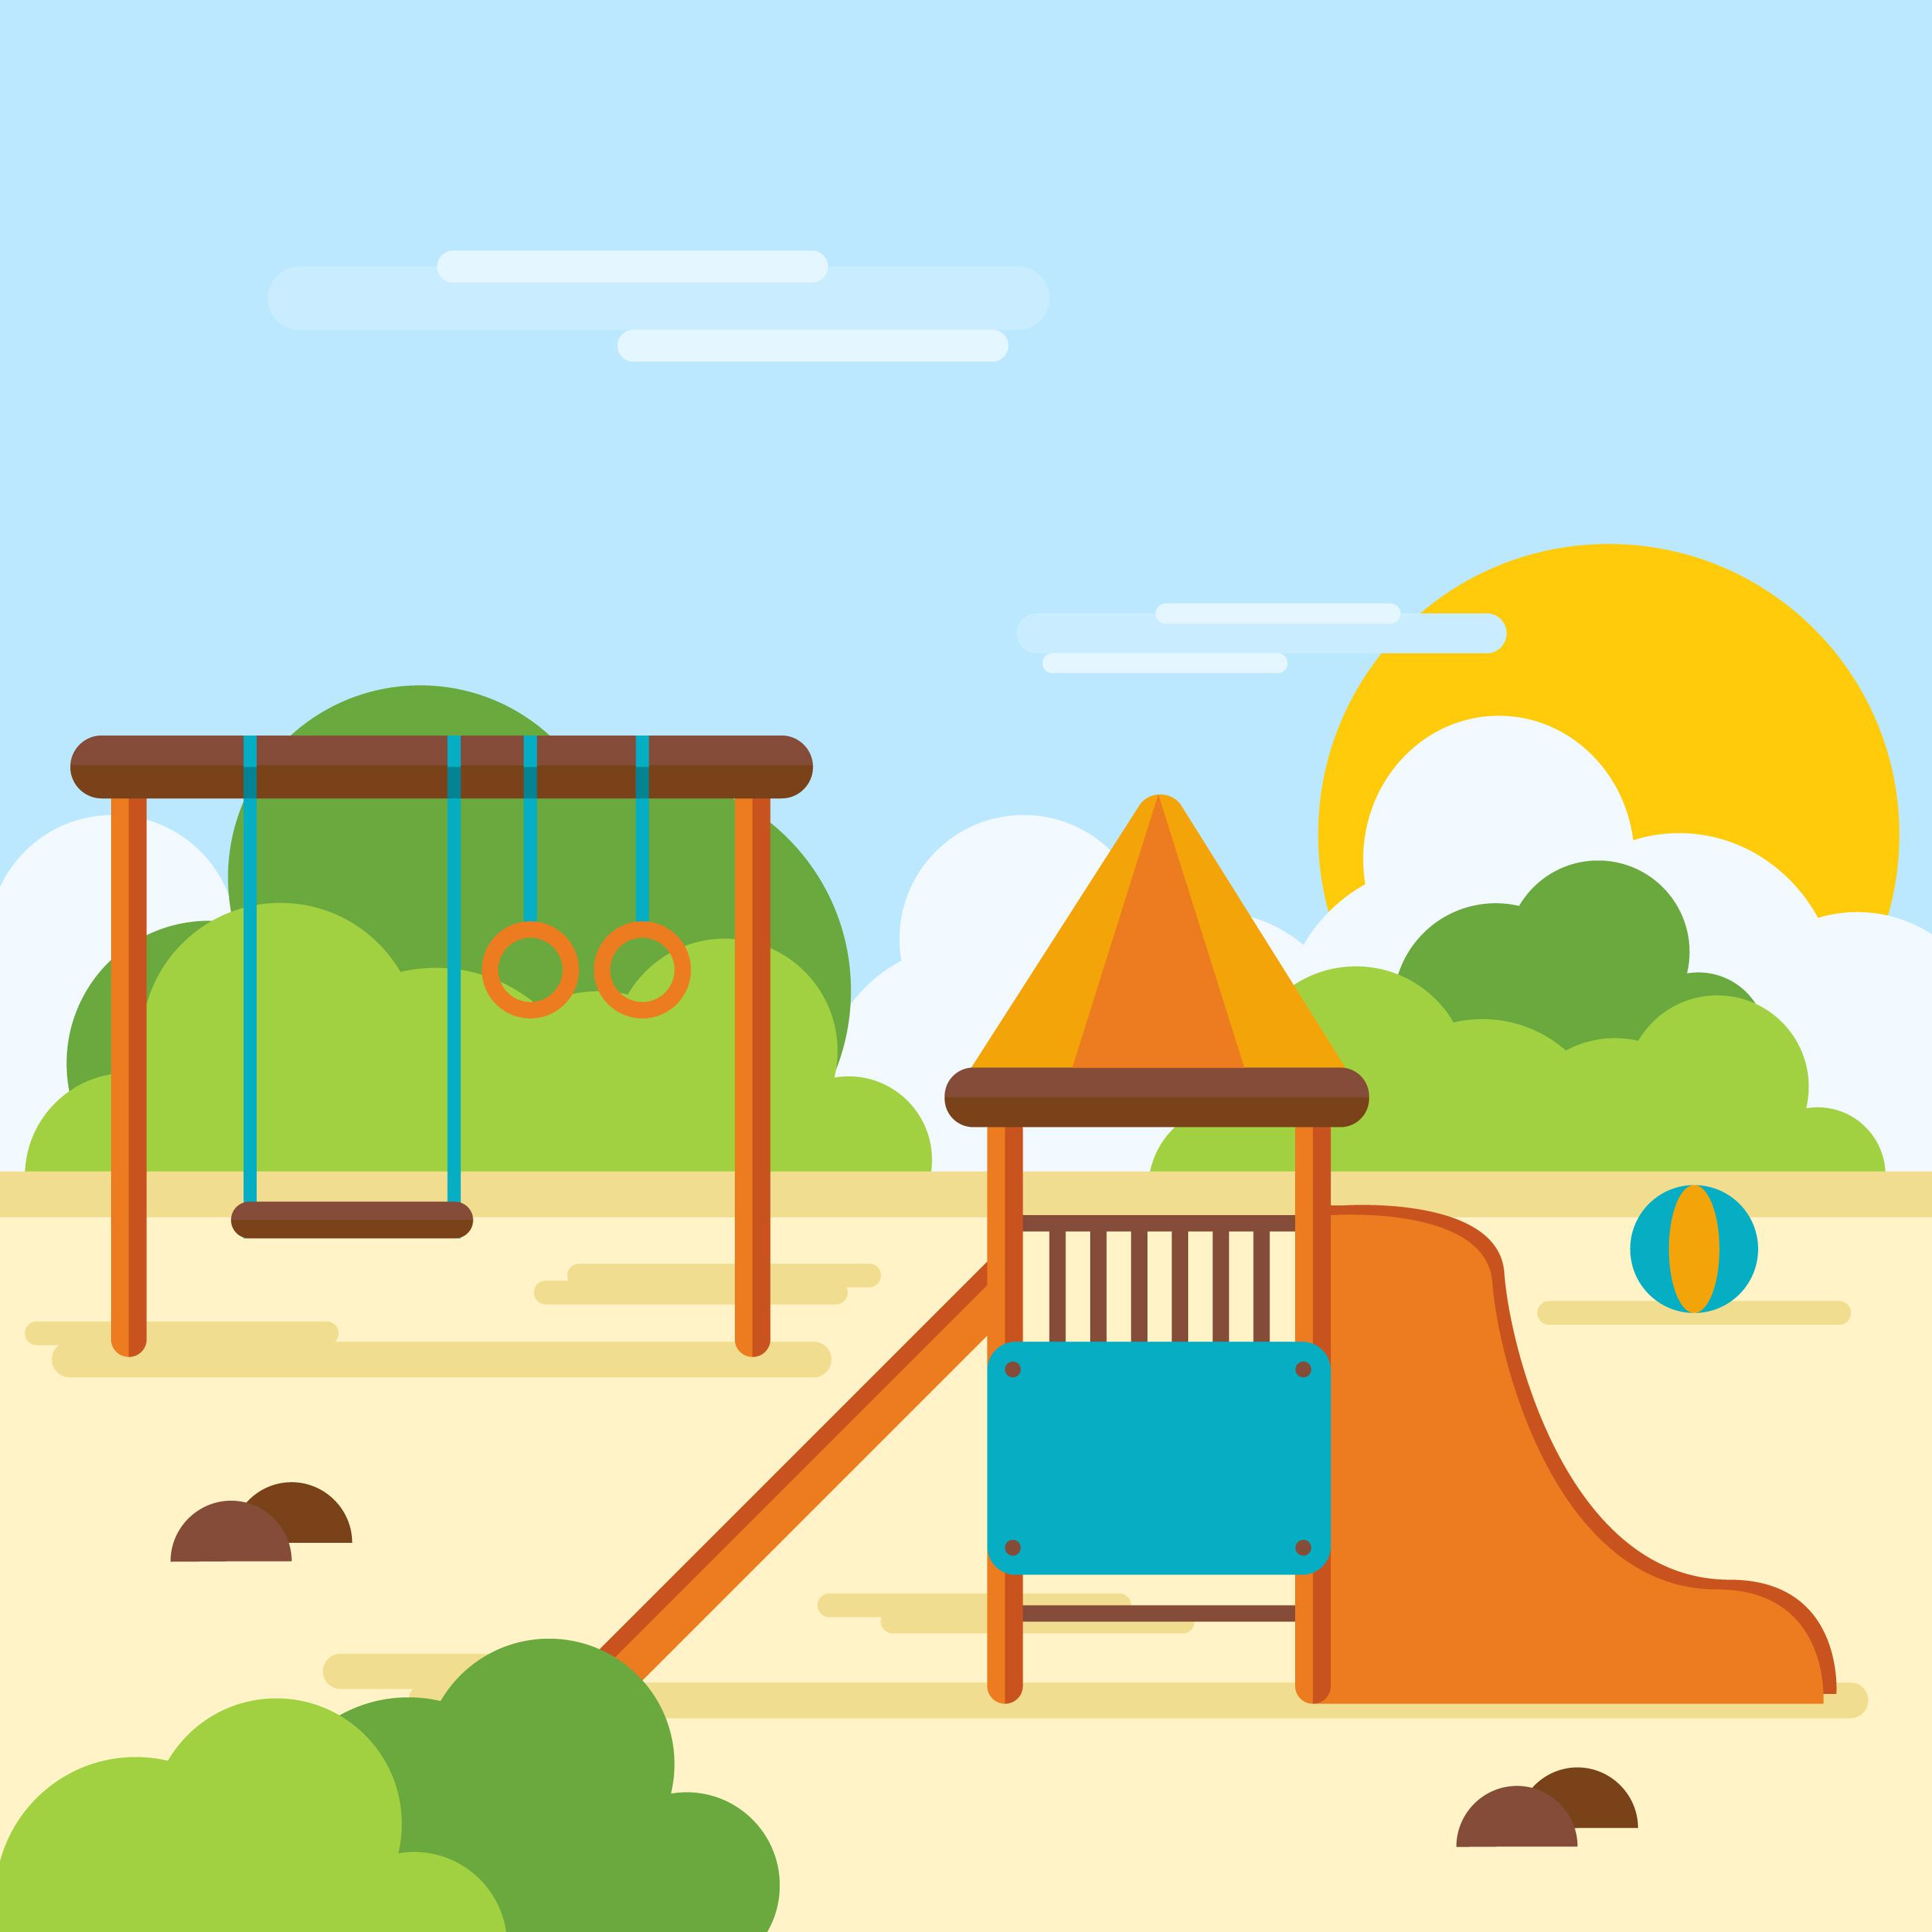 Happy Kids In A Playground Art